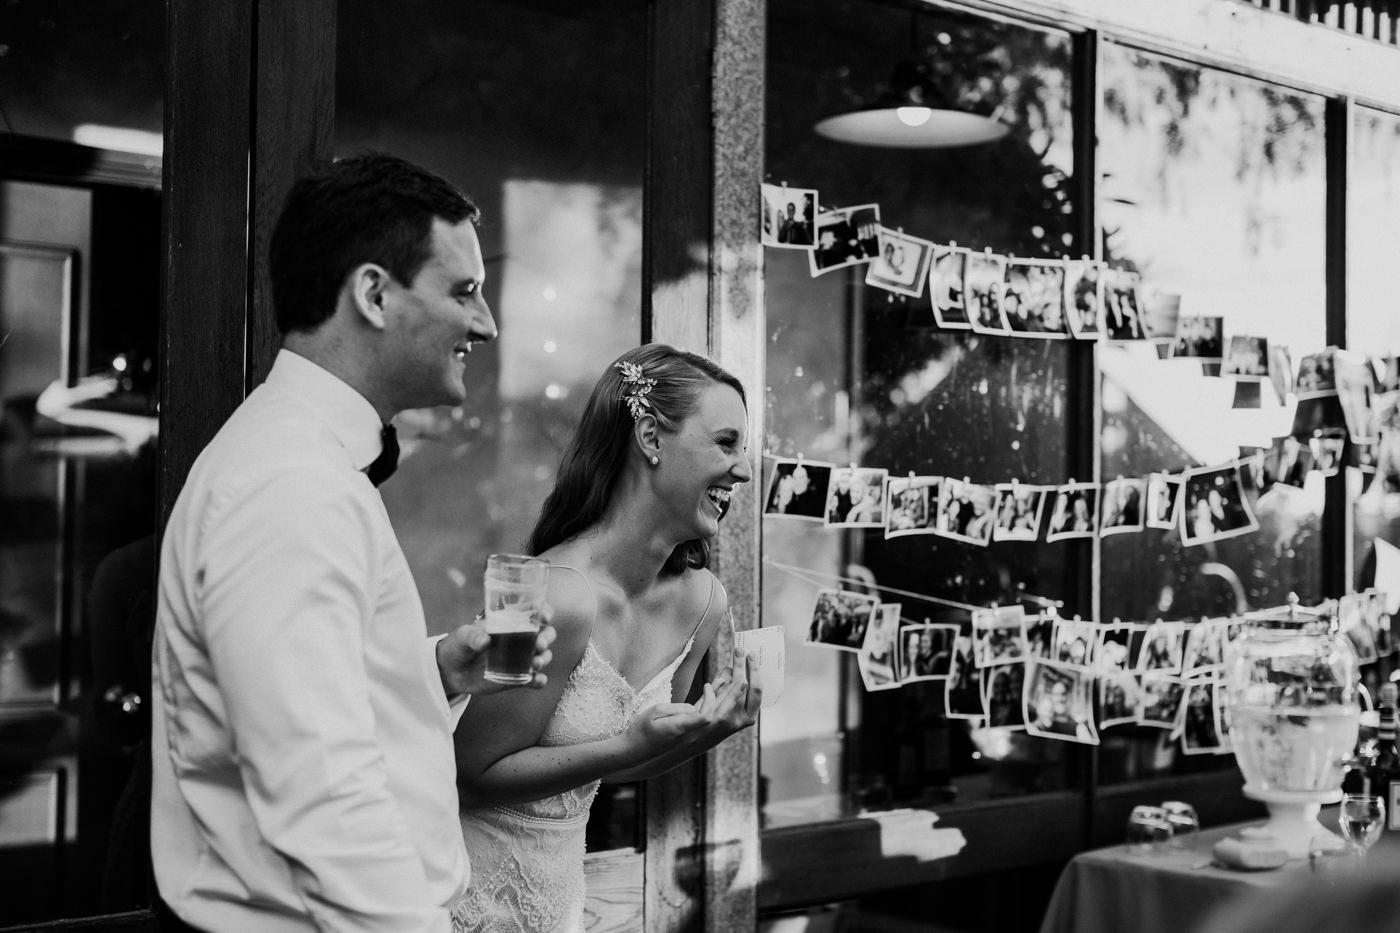 Anthony & Eliet - Wagga Wagga Wedding - Country NSW - Samantha Heather Photography-143.jpg